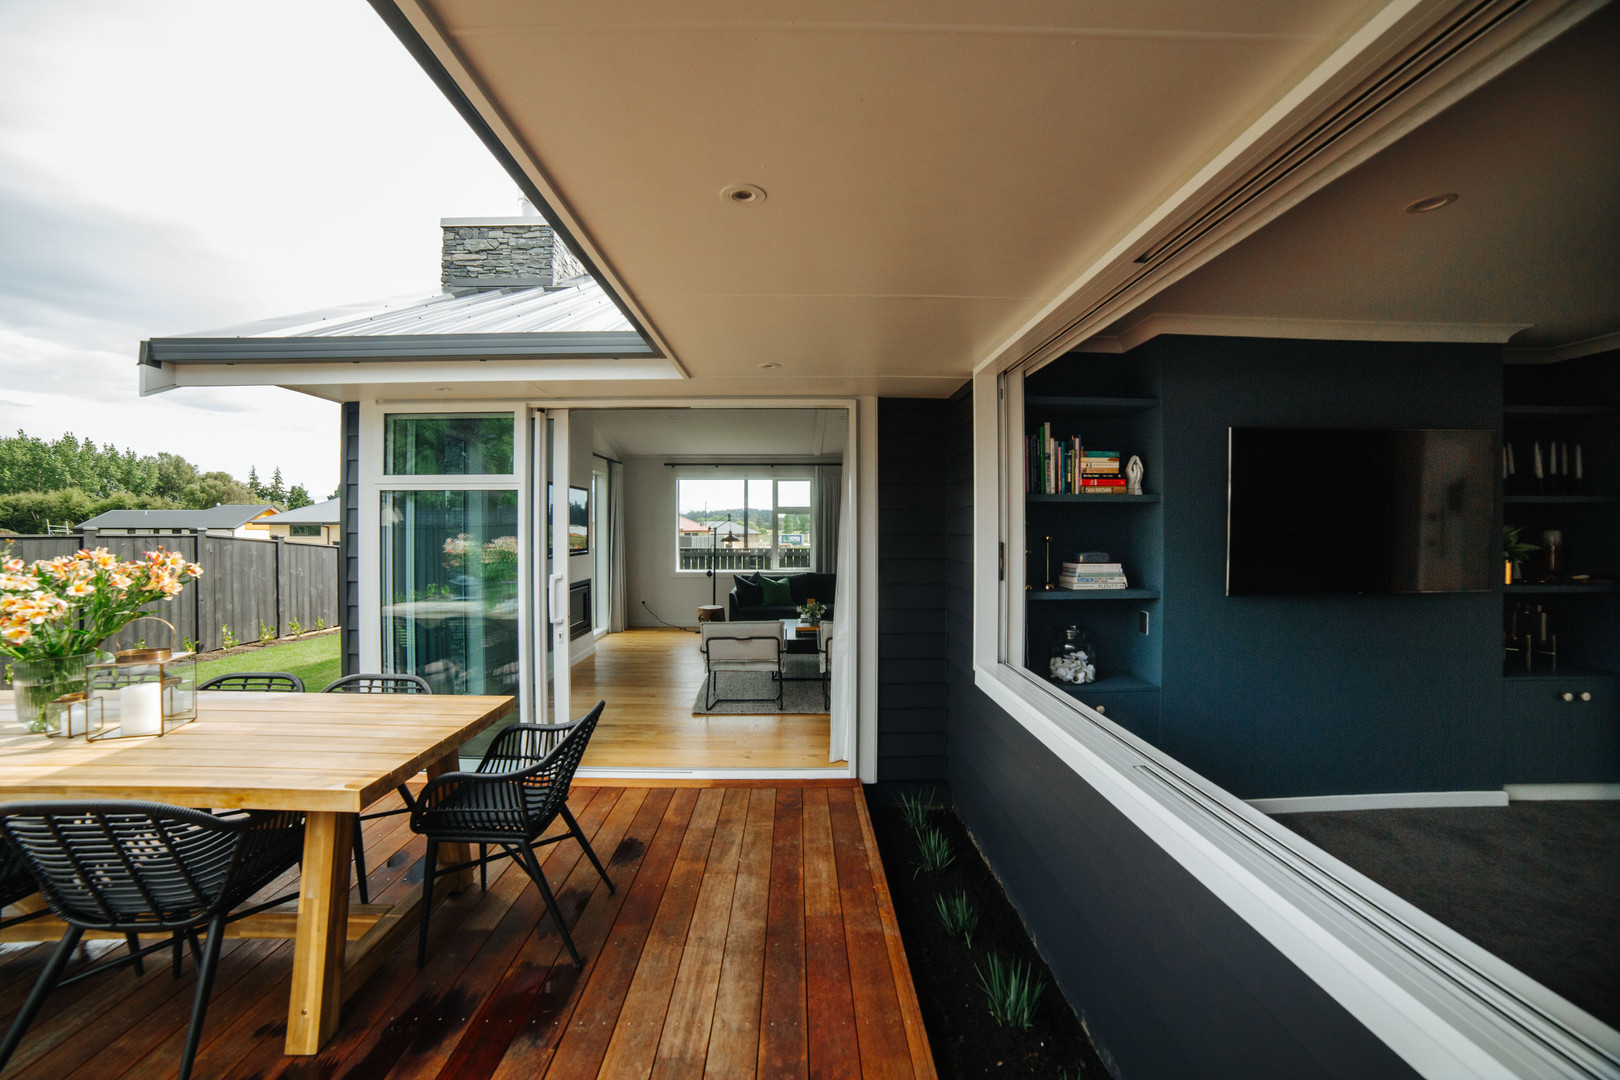 McBrimar Show Home media room window